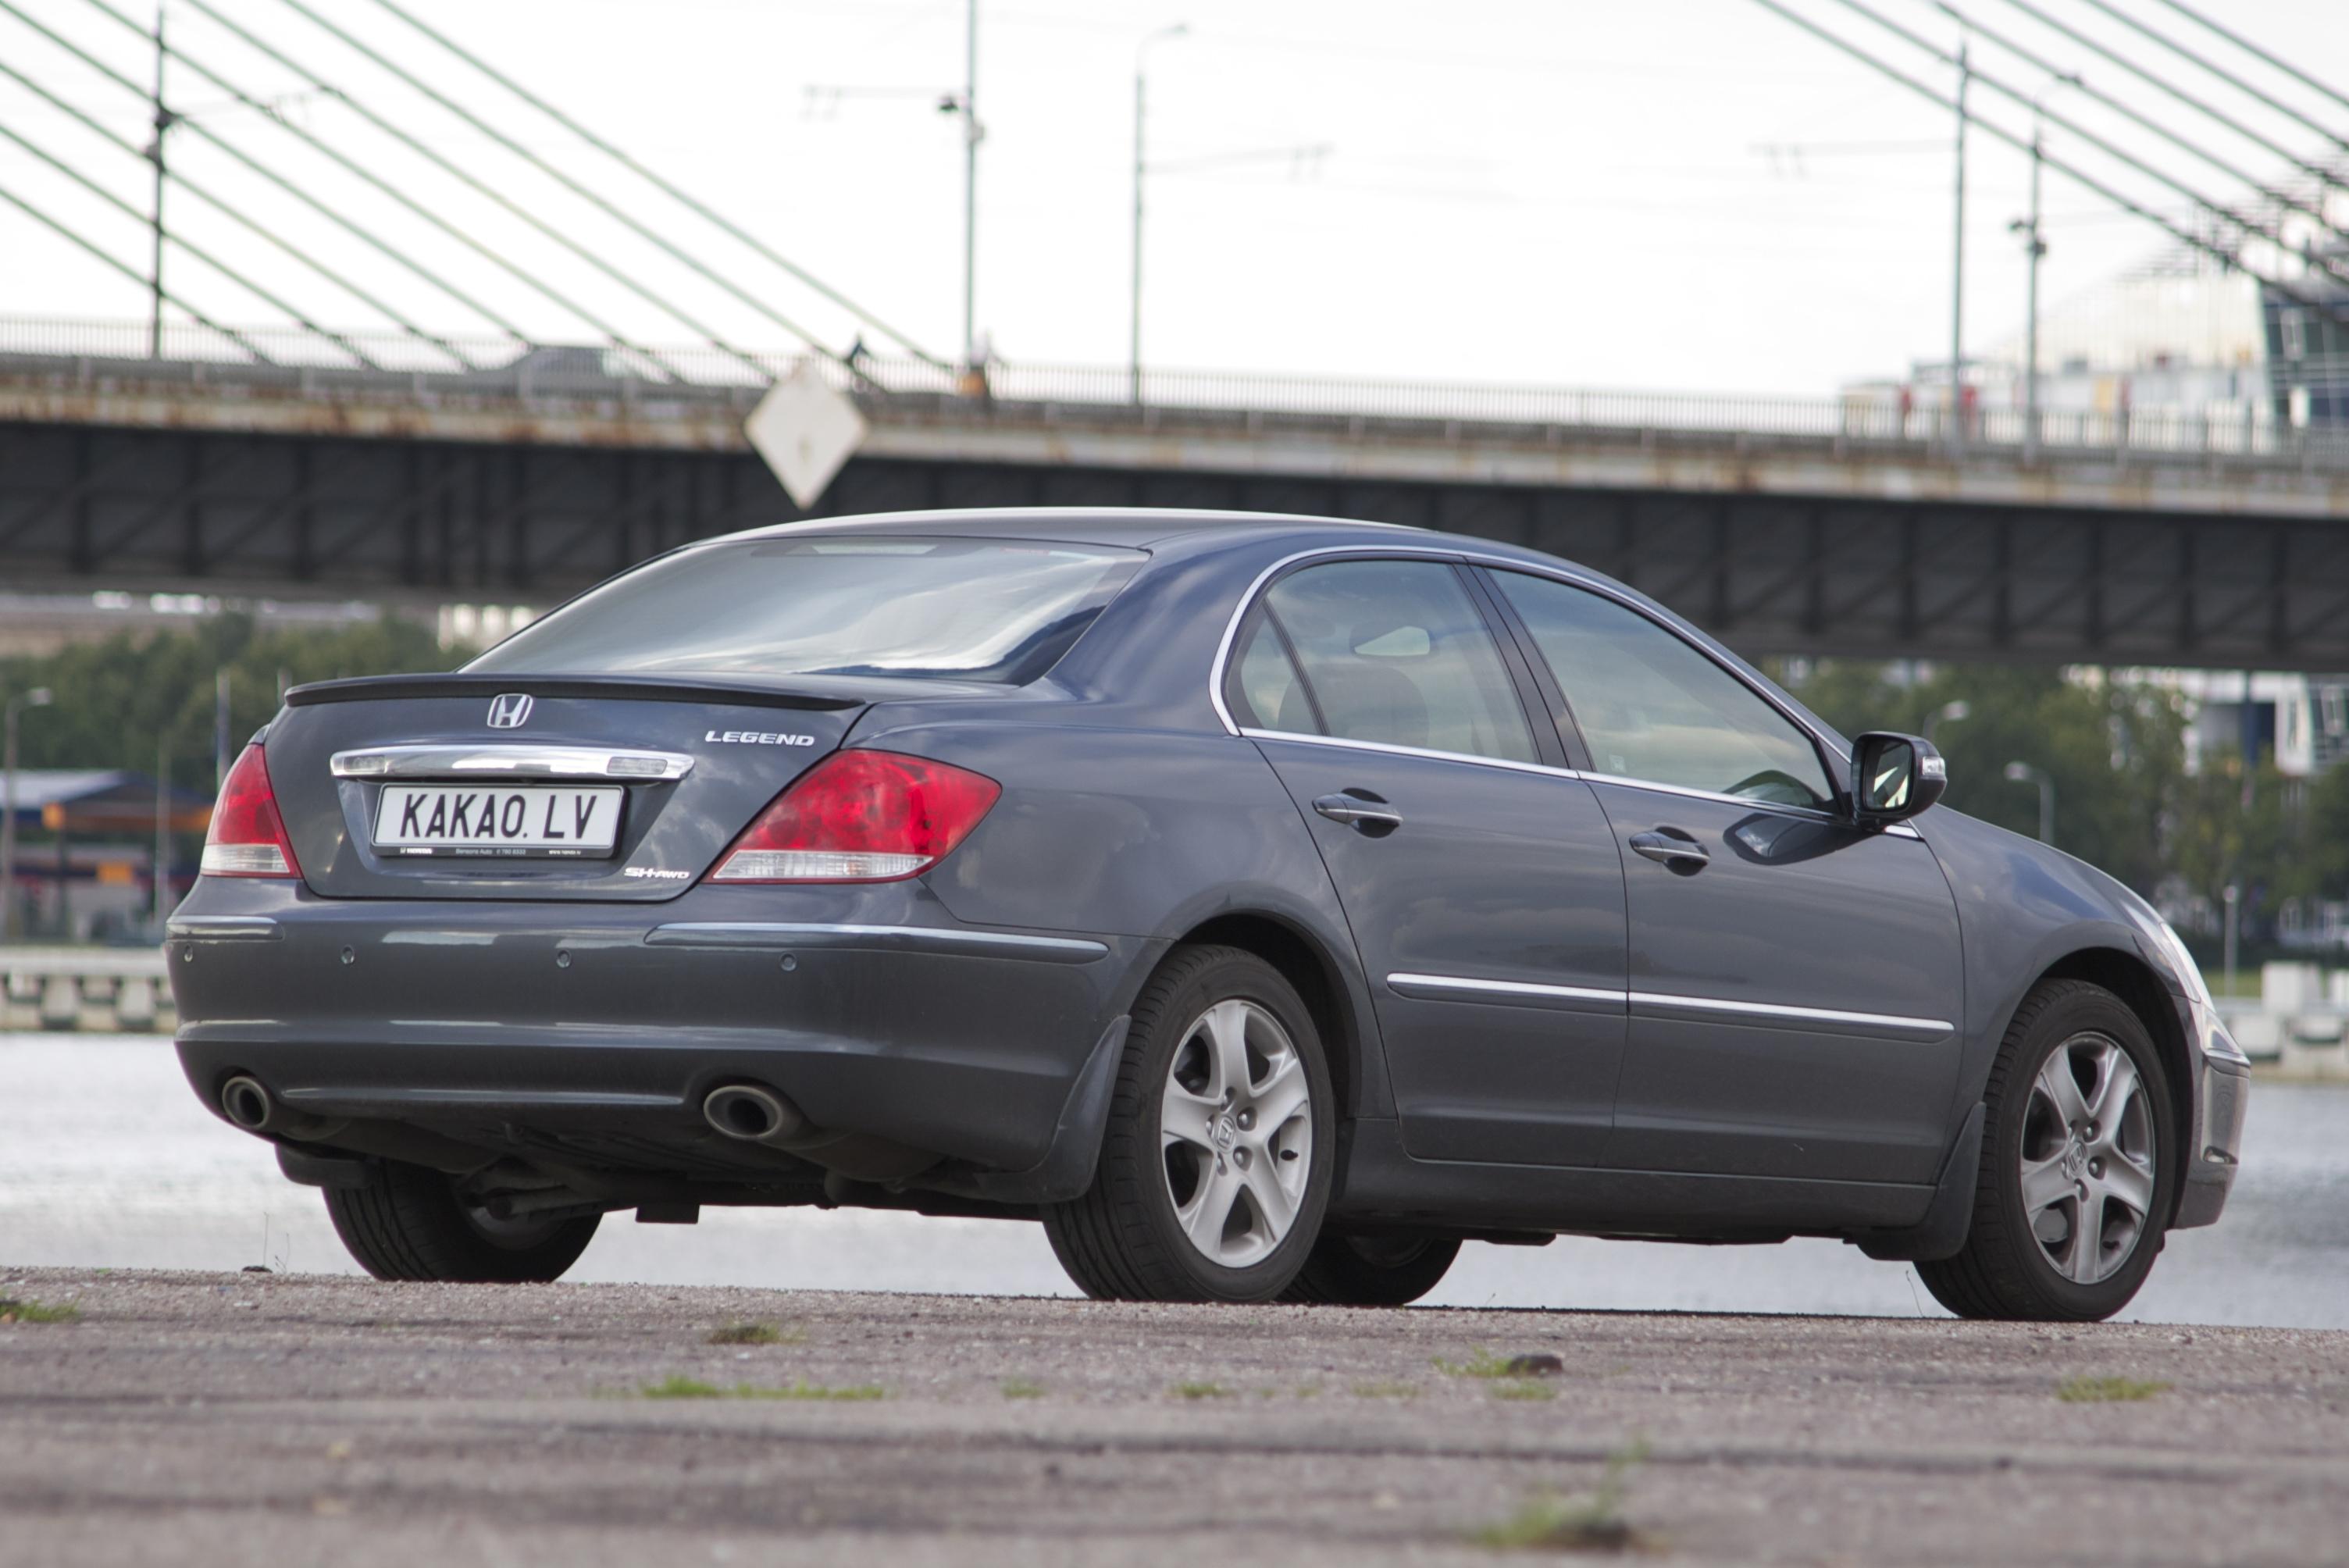 File:Honda Legend 2007 109 (8447064153).jpg - Wikimedia ...